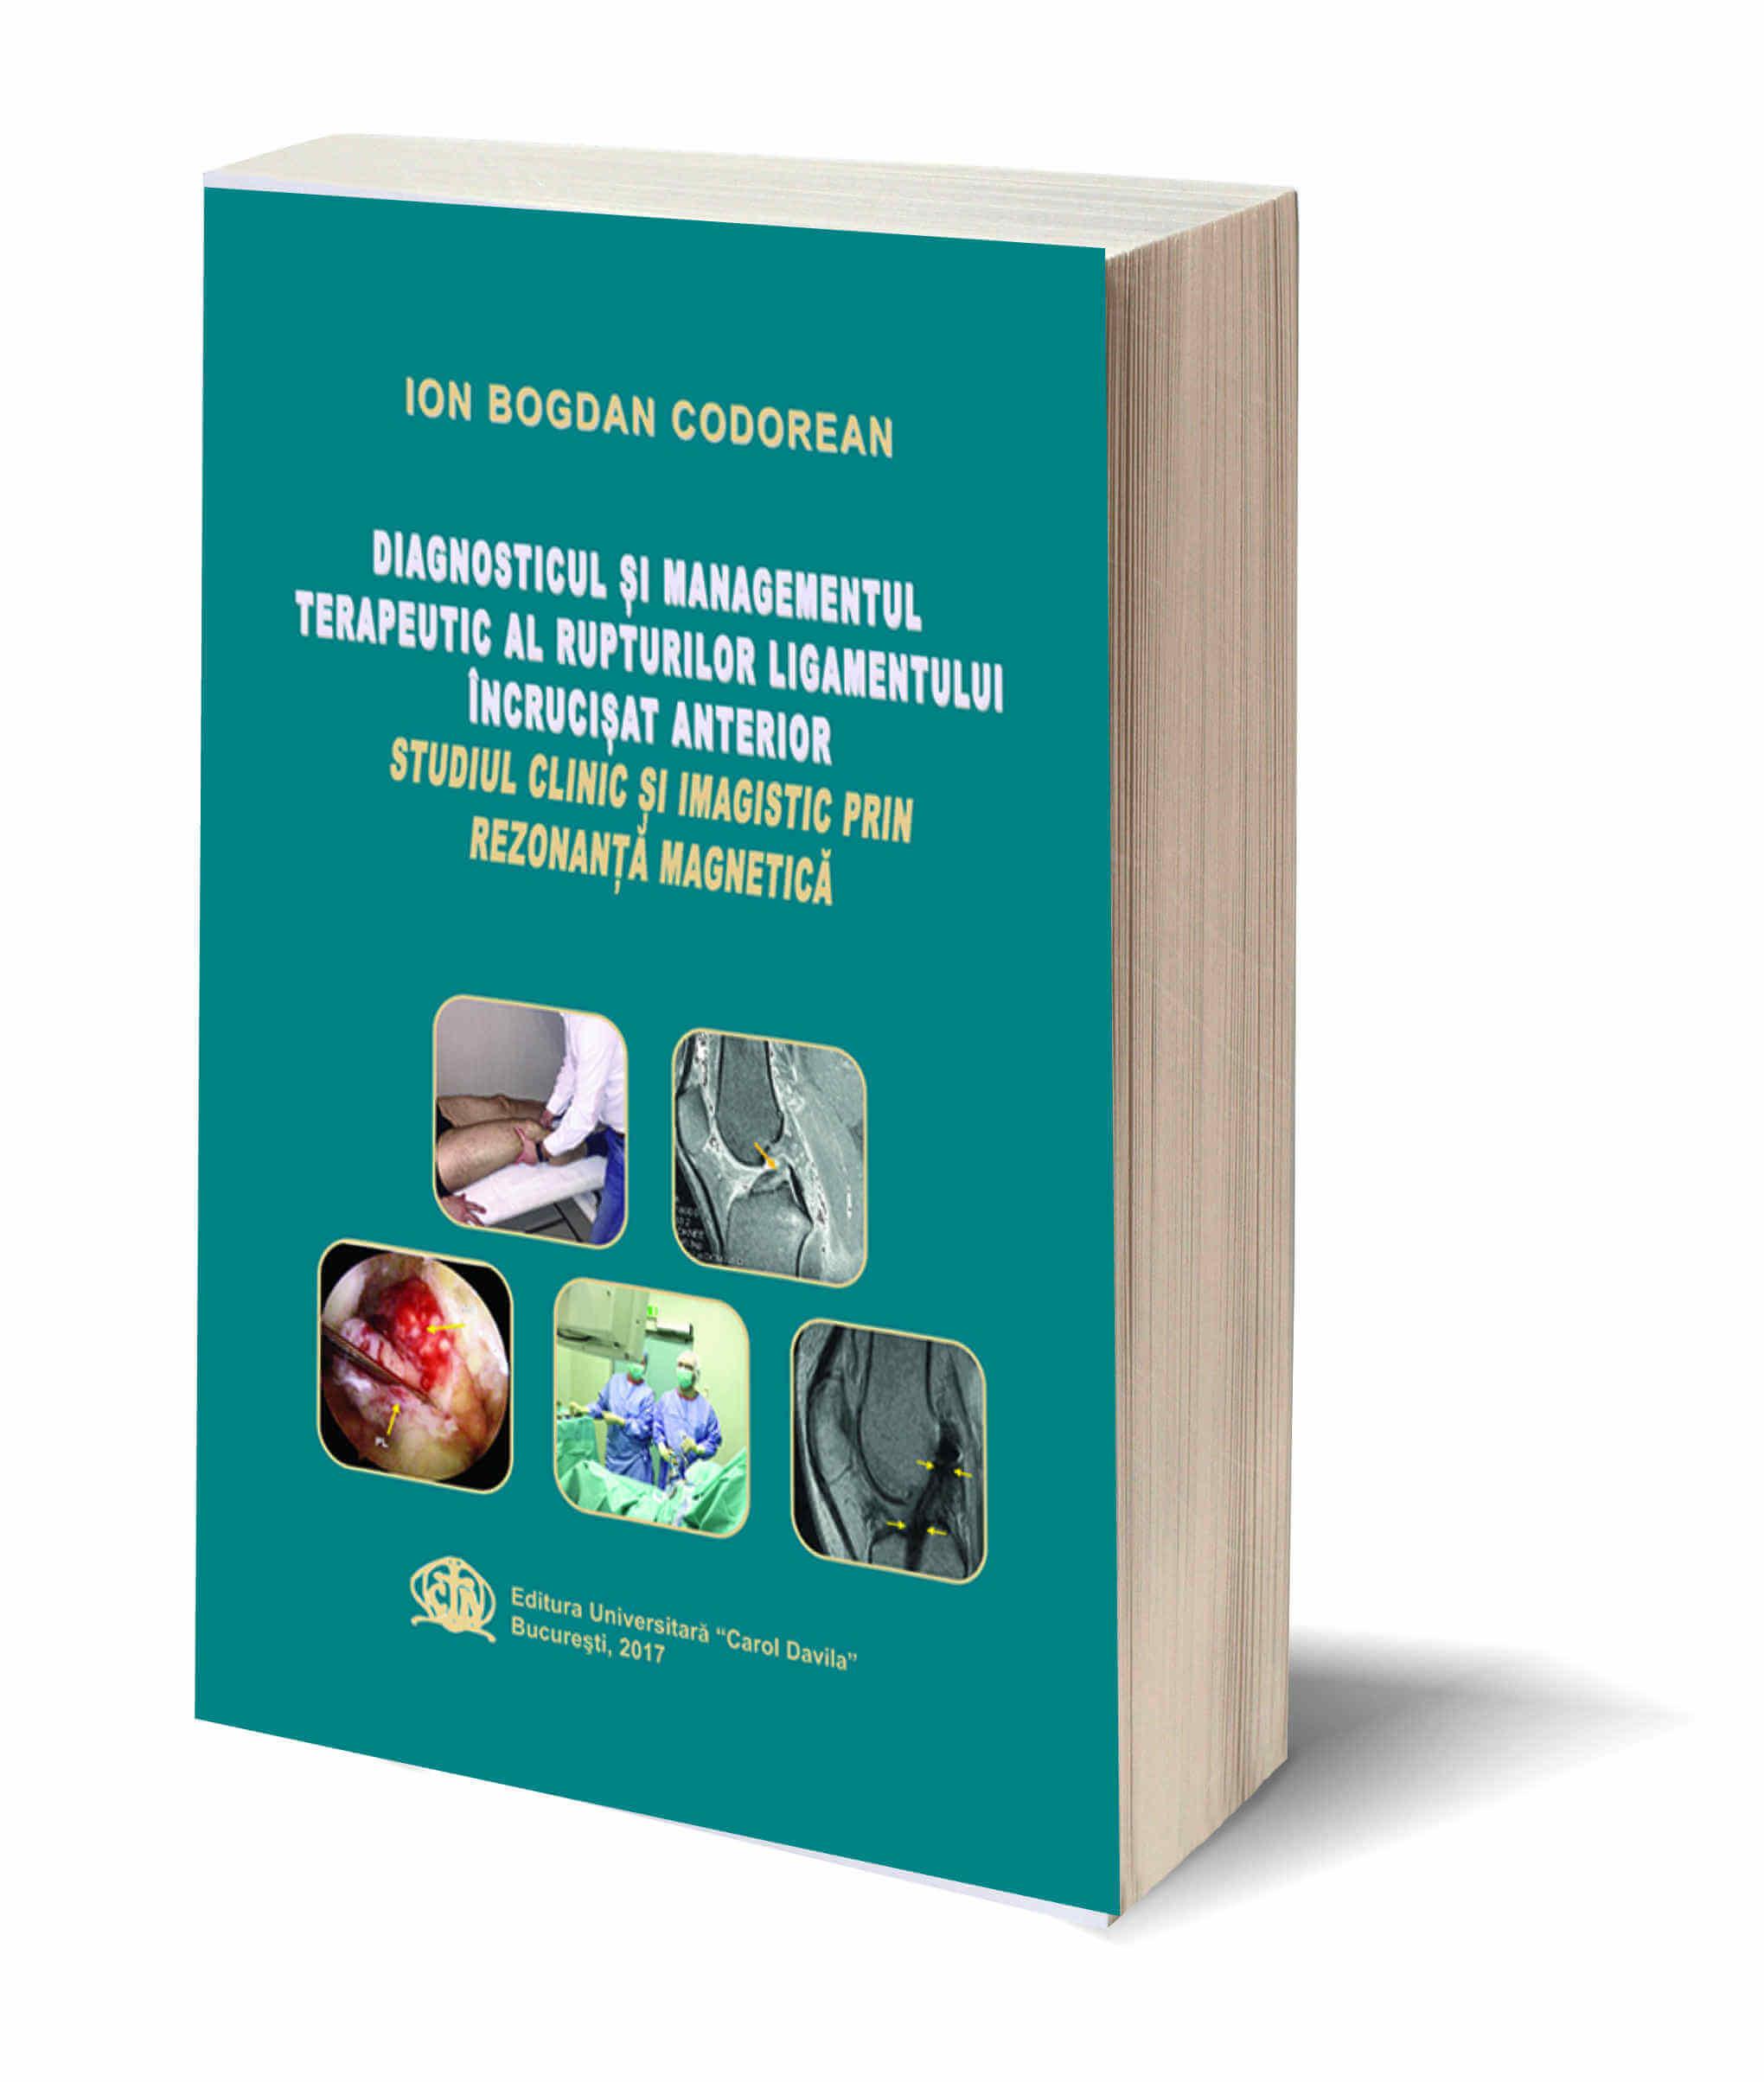 Diagnosticul si managementul terapeutic al rupturilor ligamentului incrucisat anterior – Studiu clinic si imagistic prin rezonanta magnetica